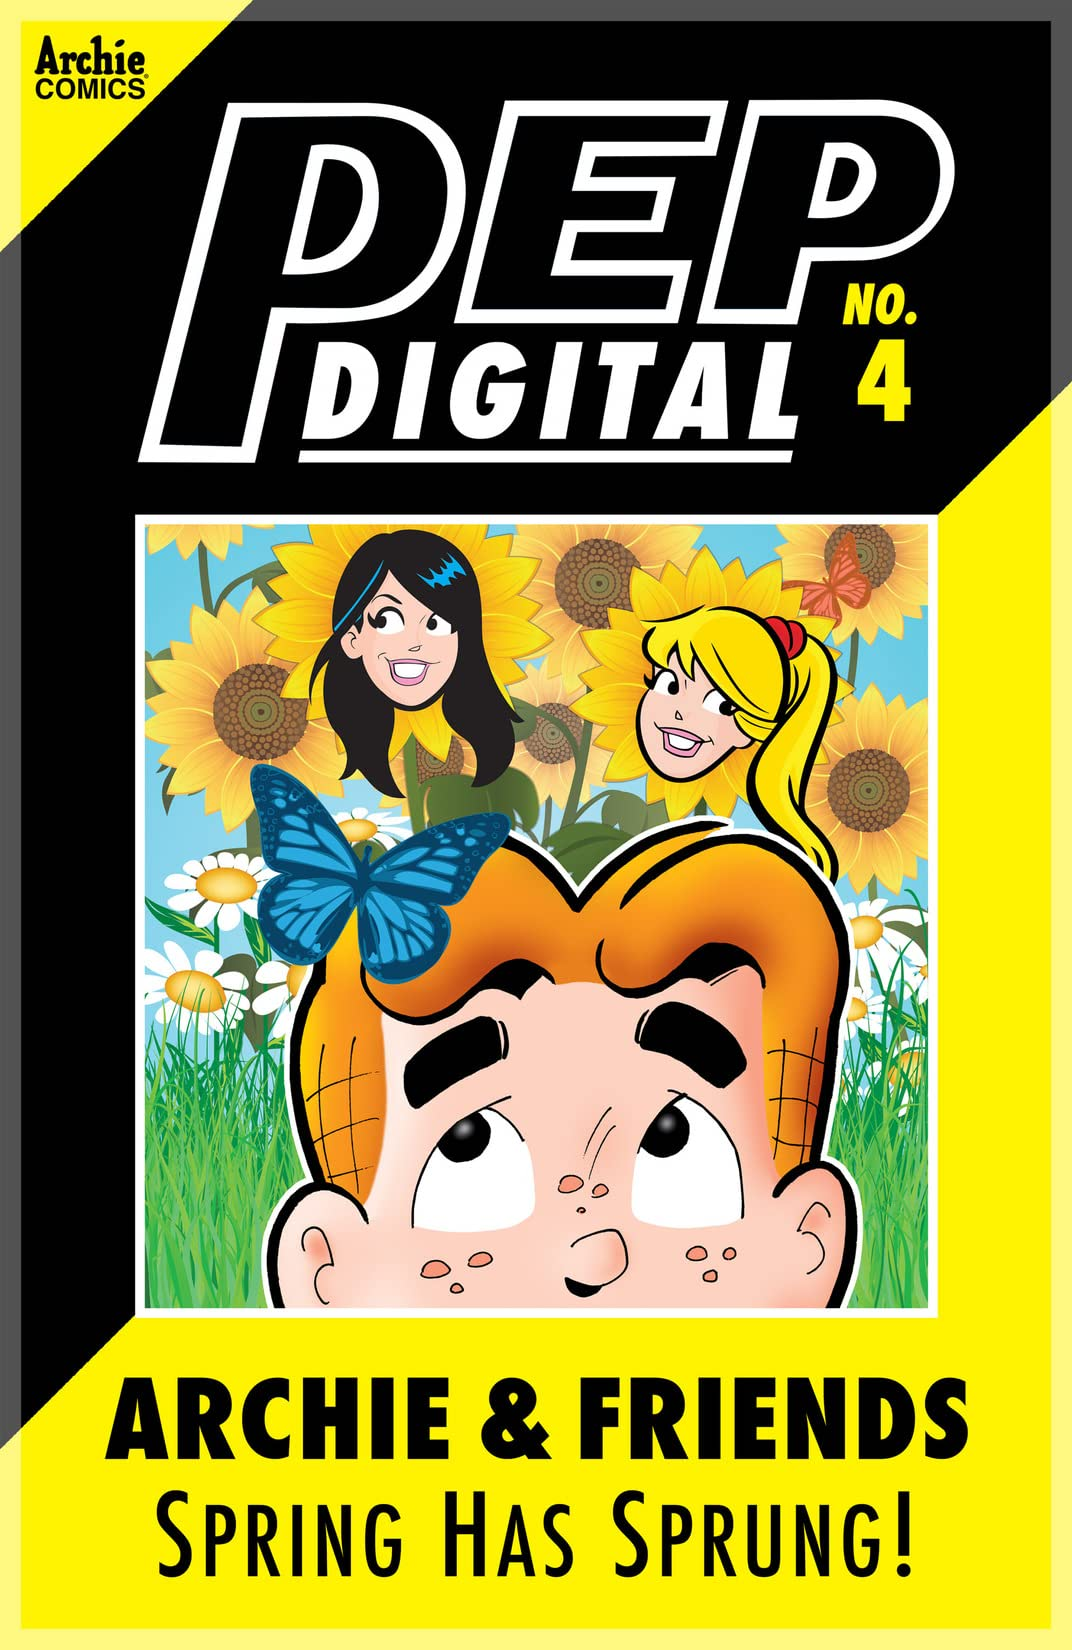 PEP Digital #4: Archie & Friends Spring Has Sprung!